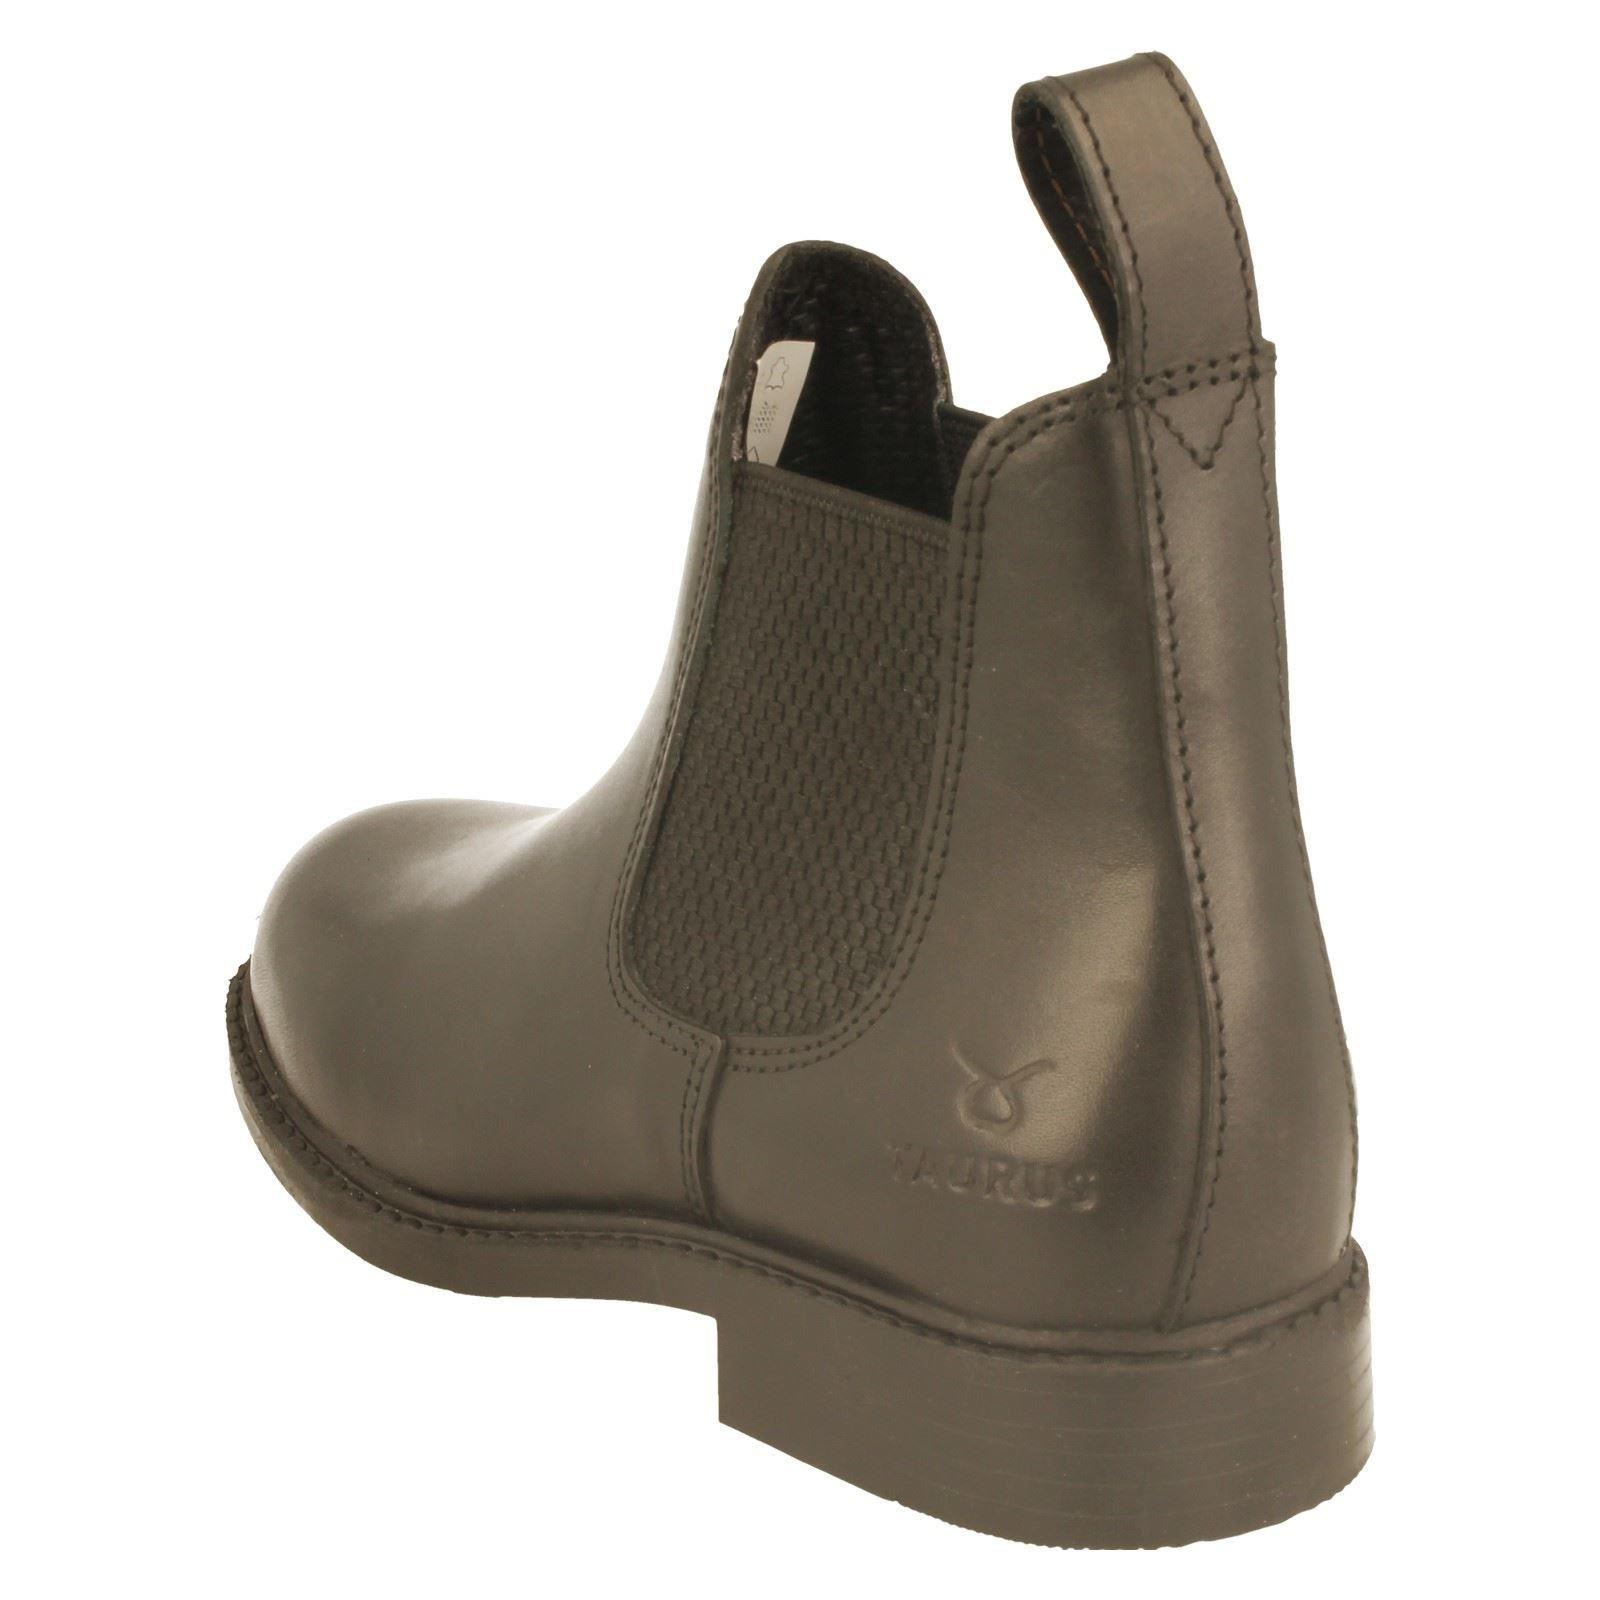 Unisex Taurus Jodphur Stiefel Style Classic-W Classic-W Style 3ab8b8